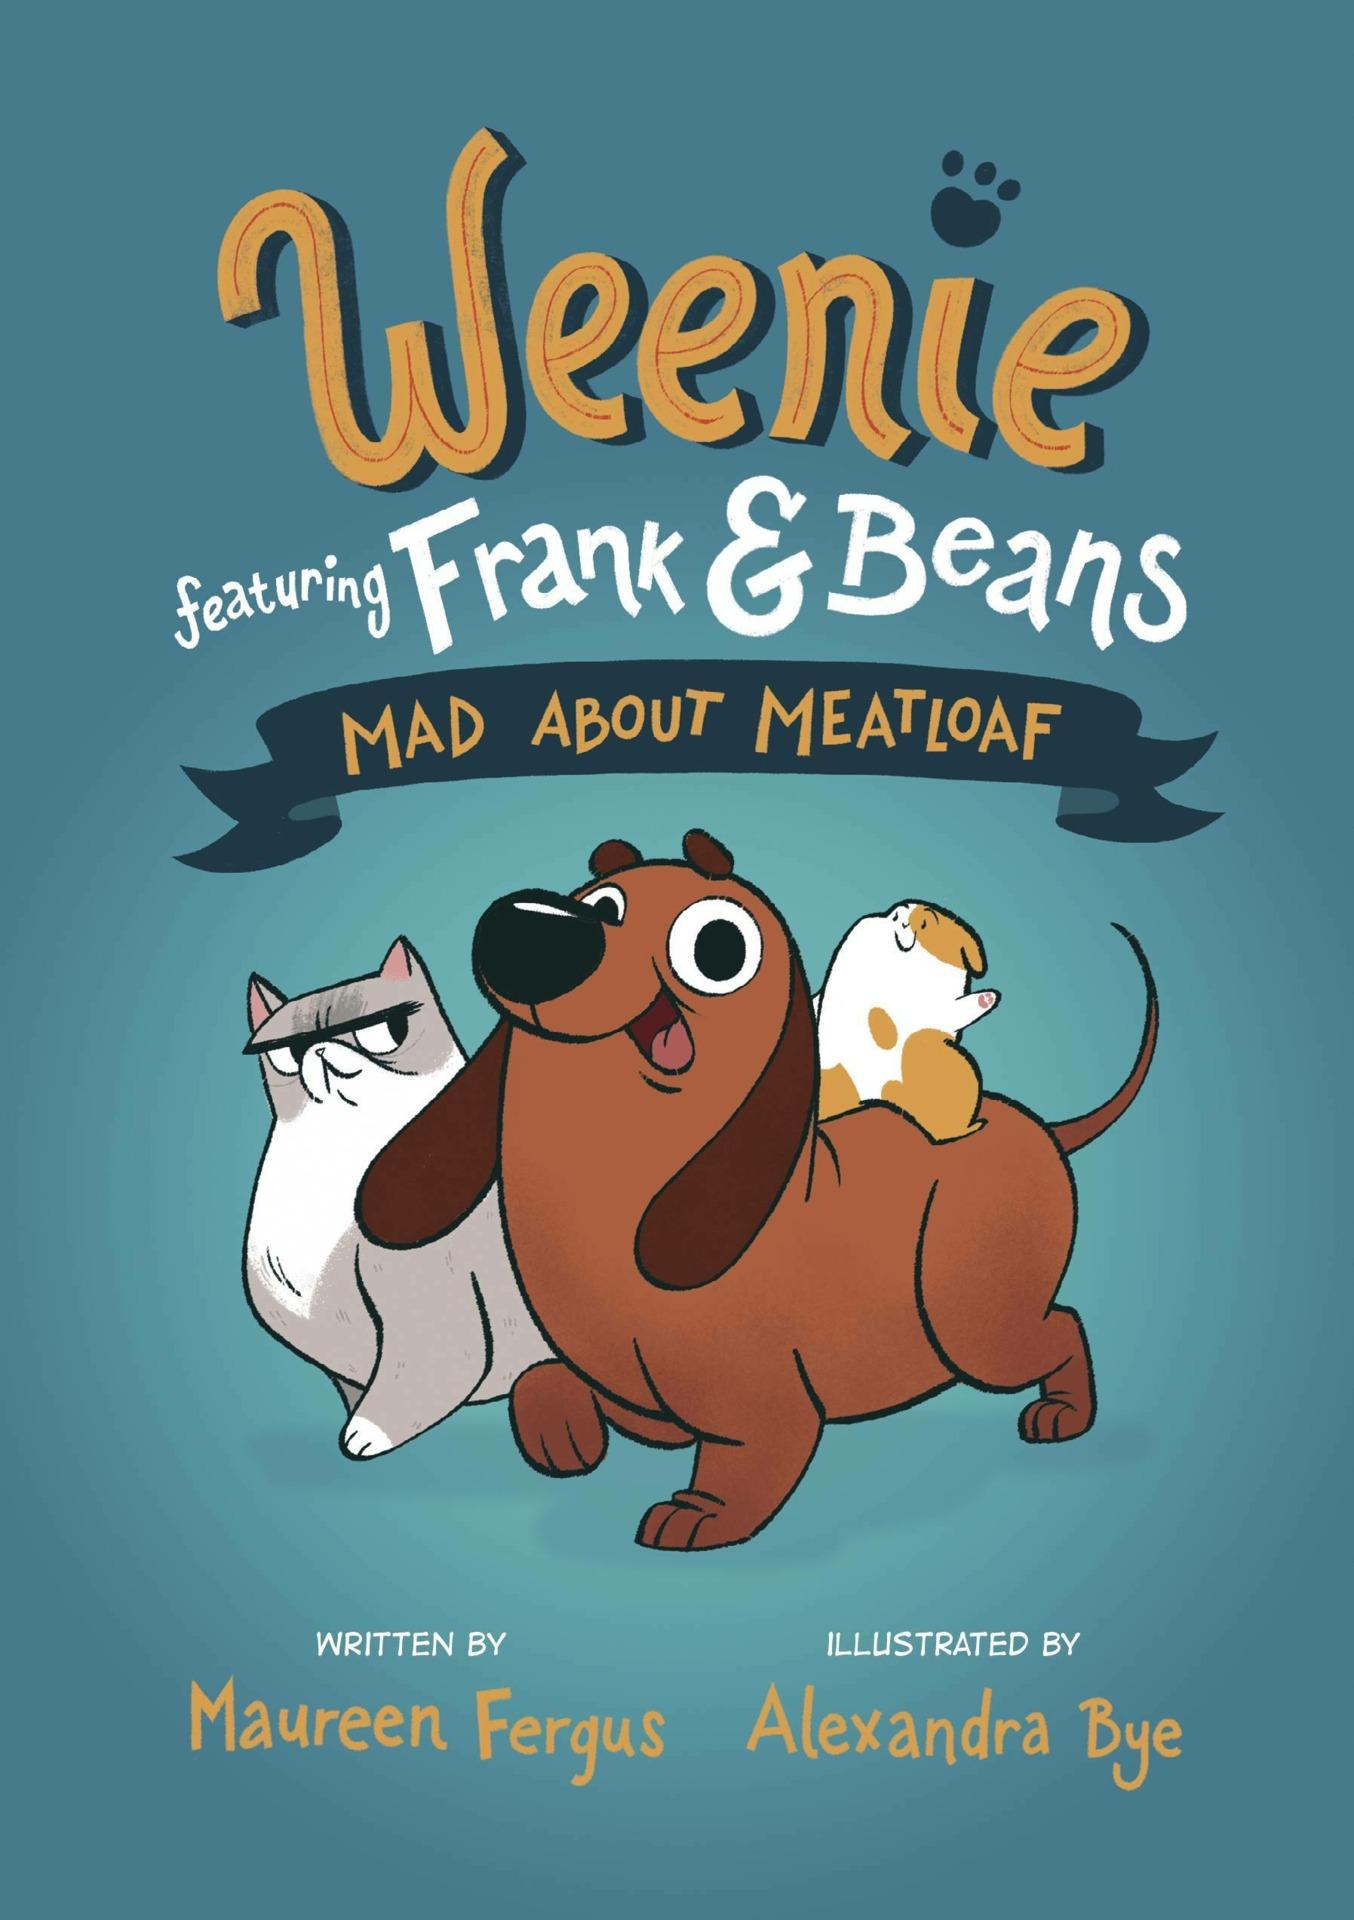 Weenie featuring Frank & Beans